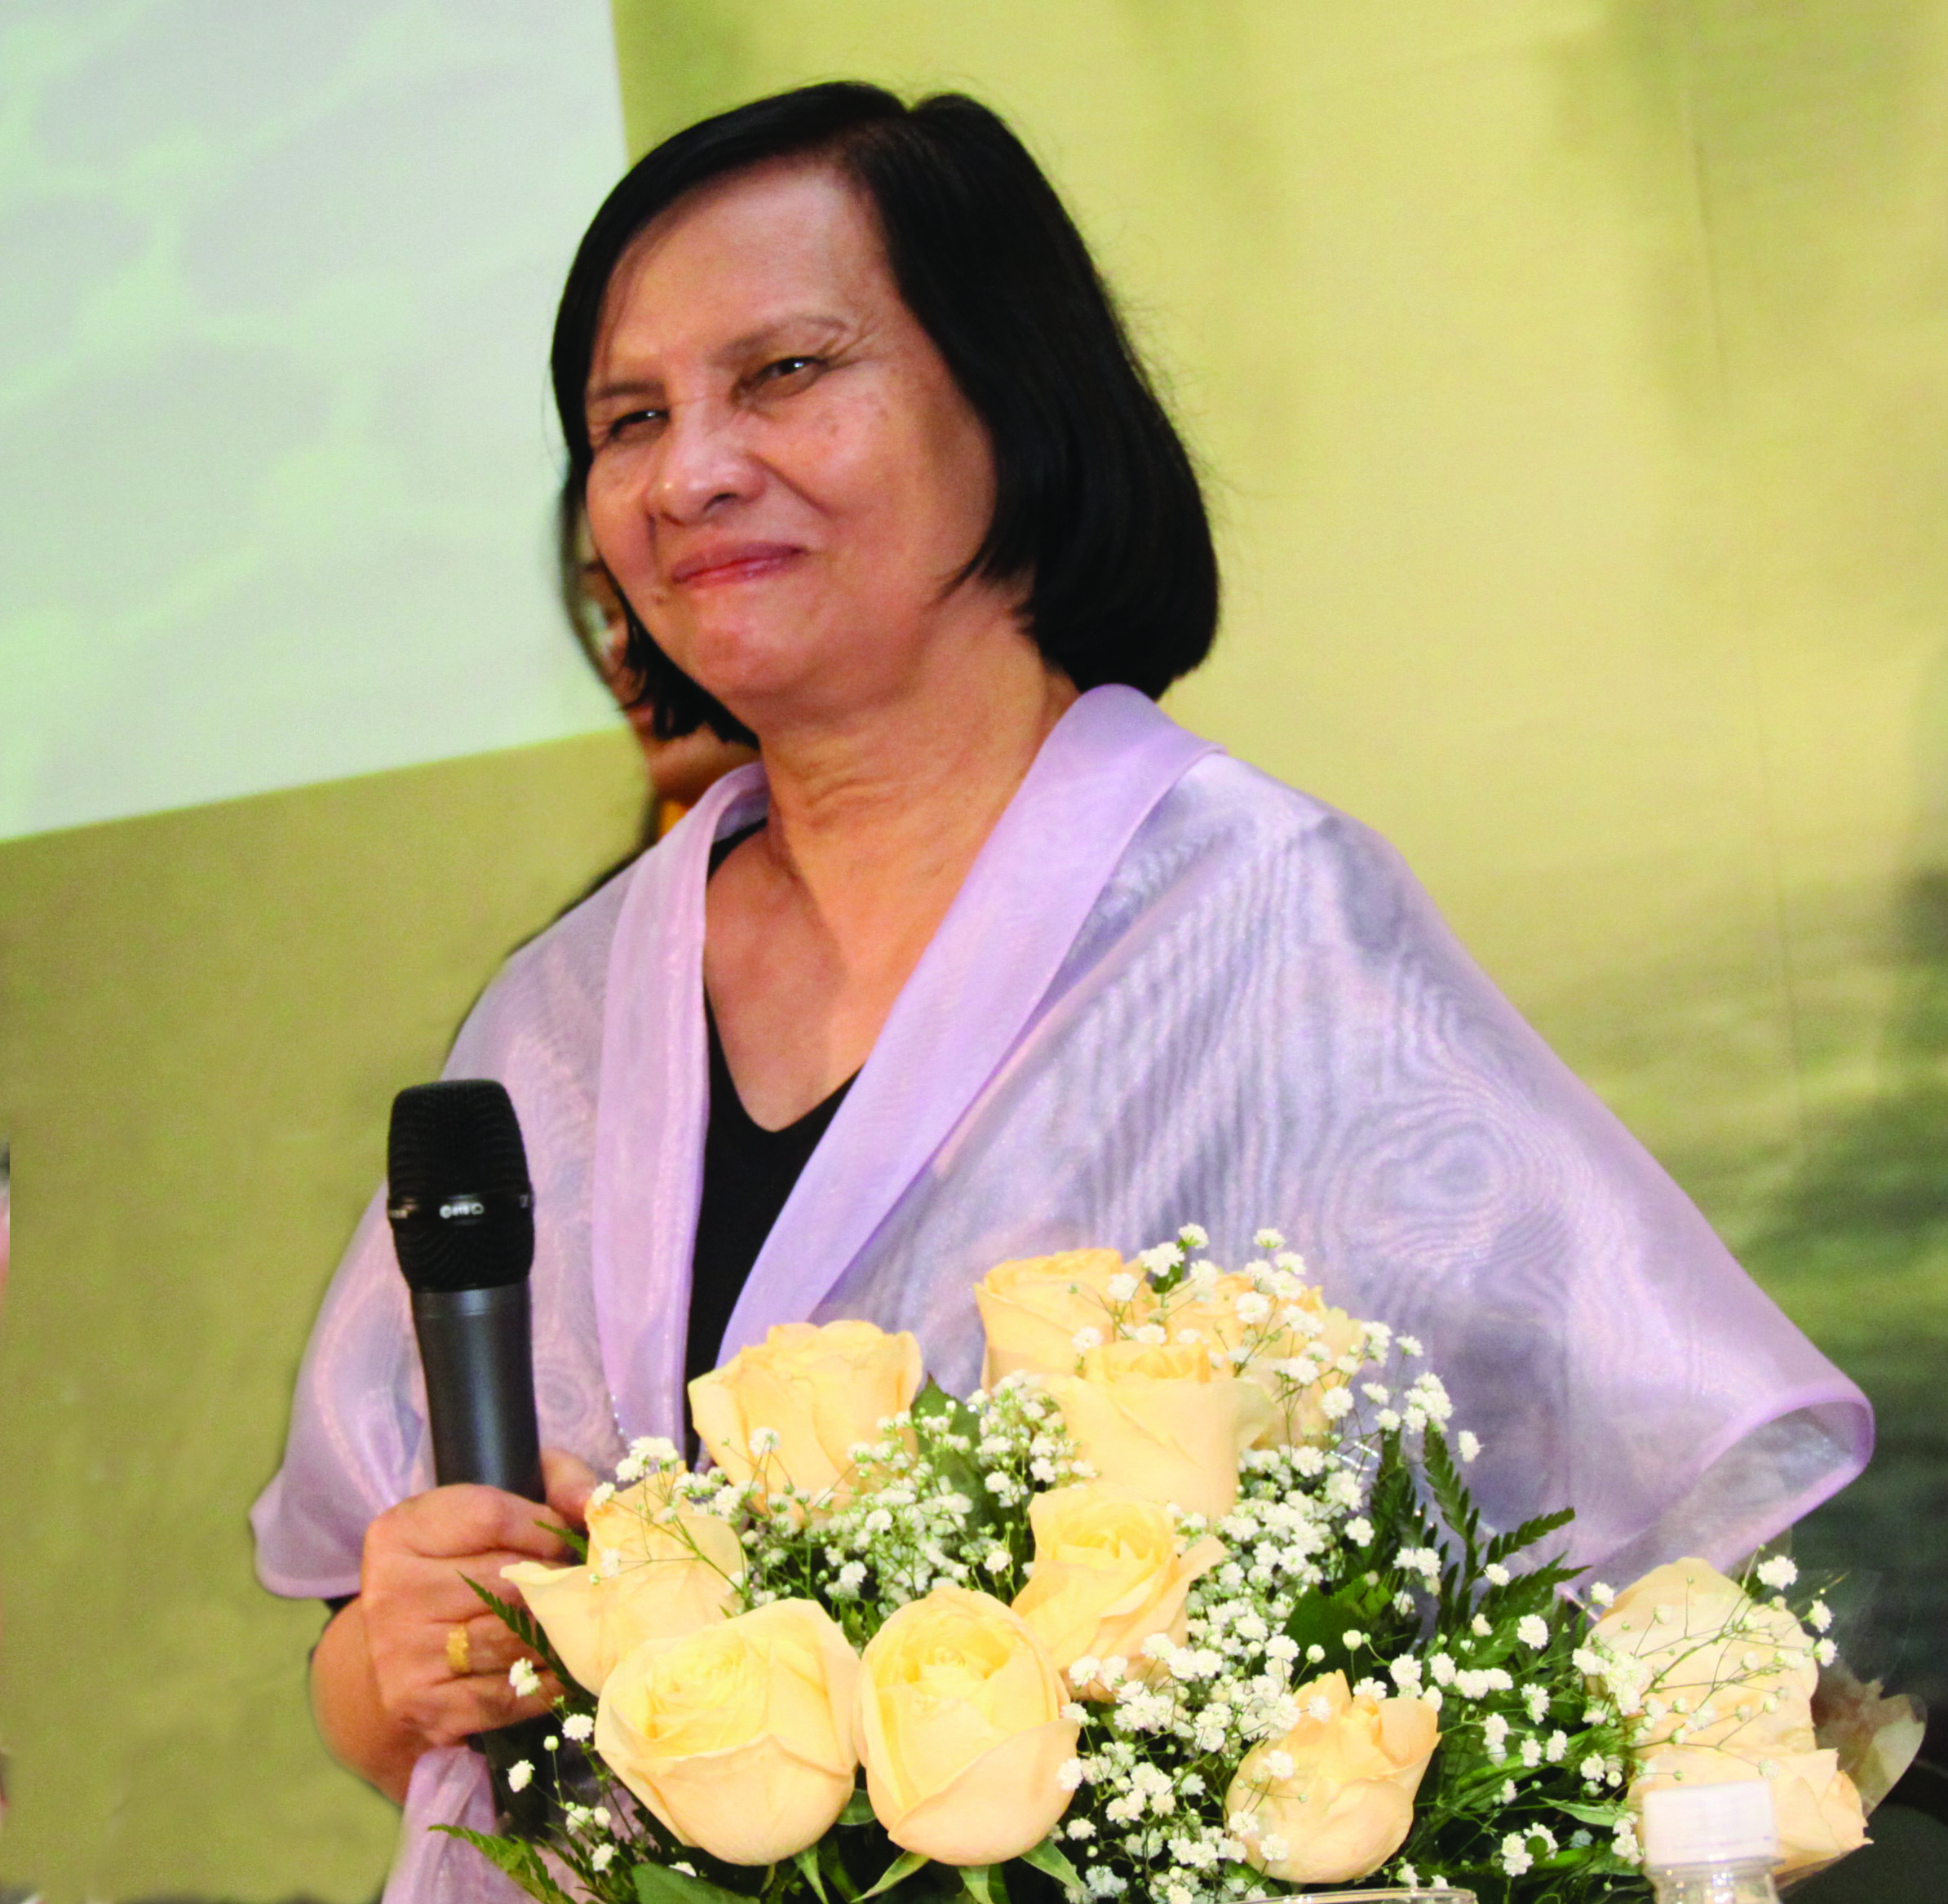 Delia Rodriquez-Amaya, Ph.D.